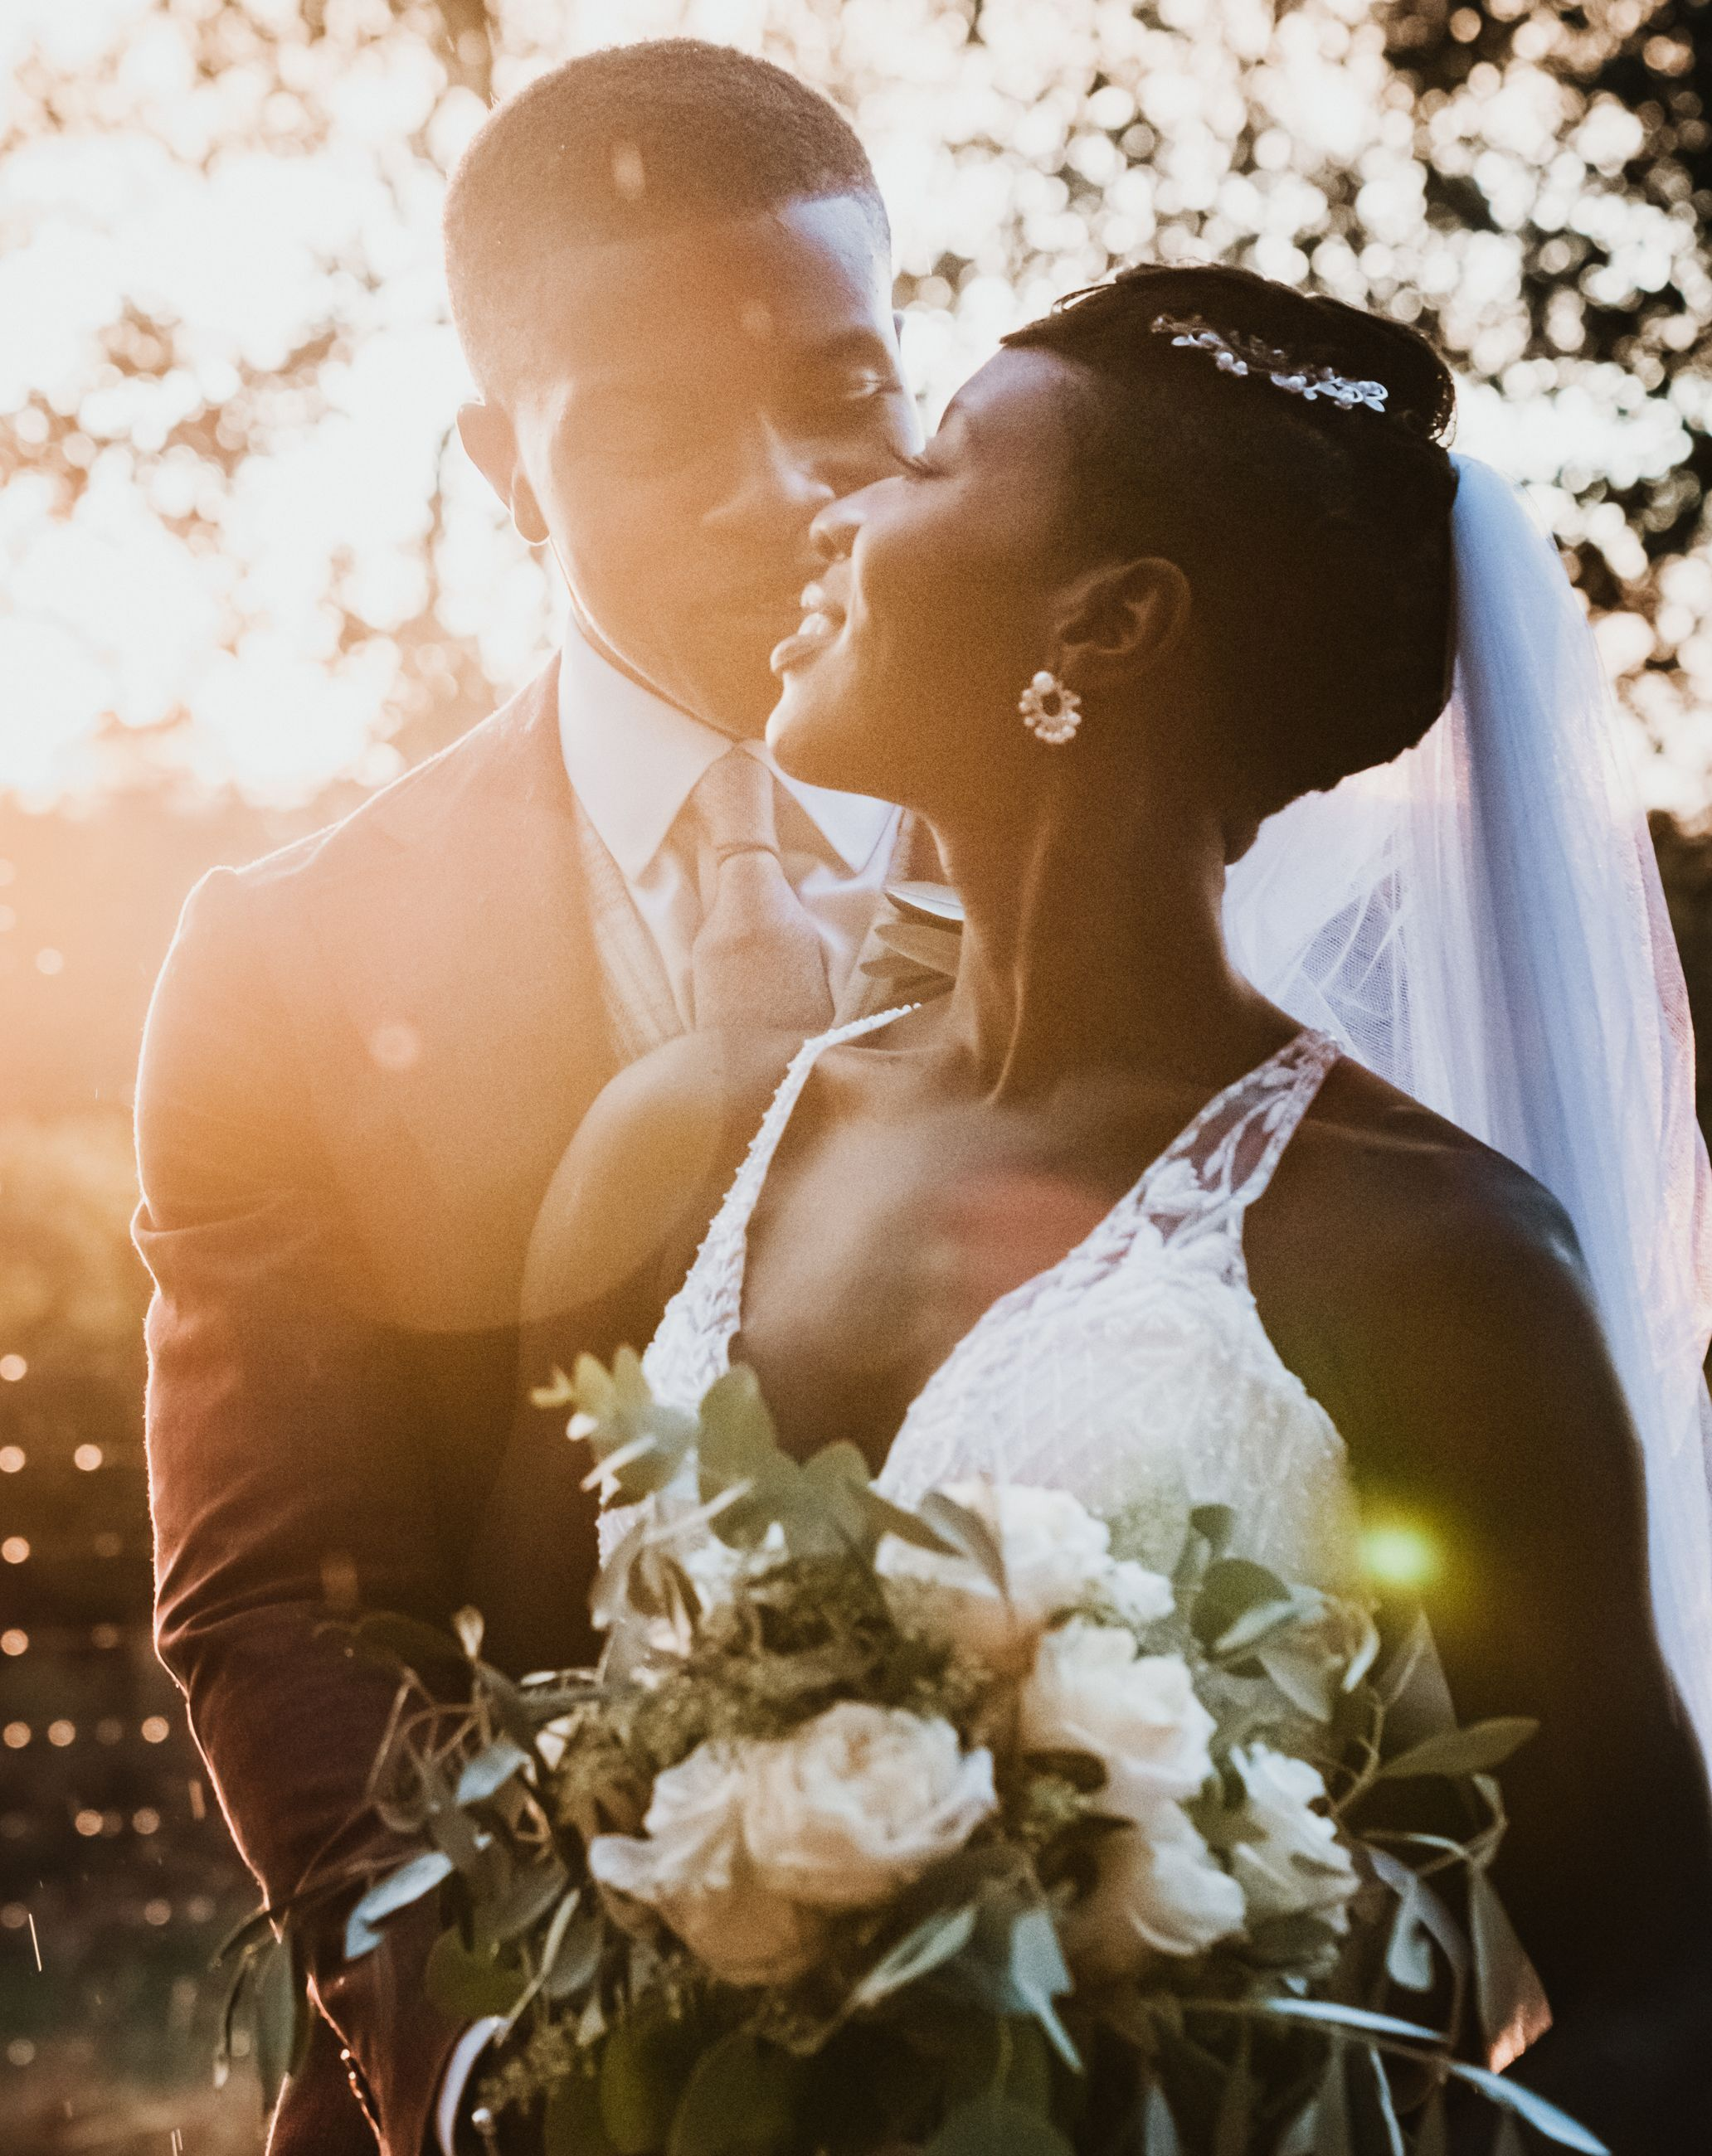 benni carol photography benni carol photography rock my wedding